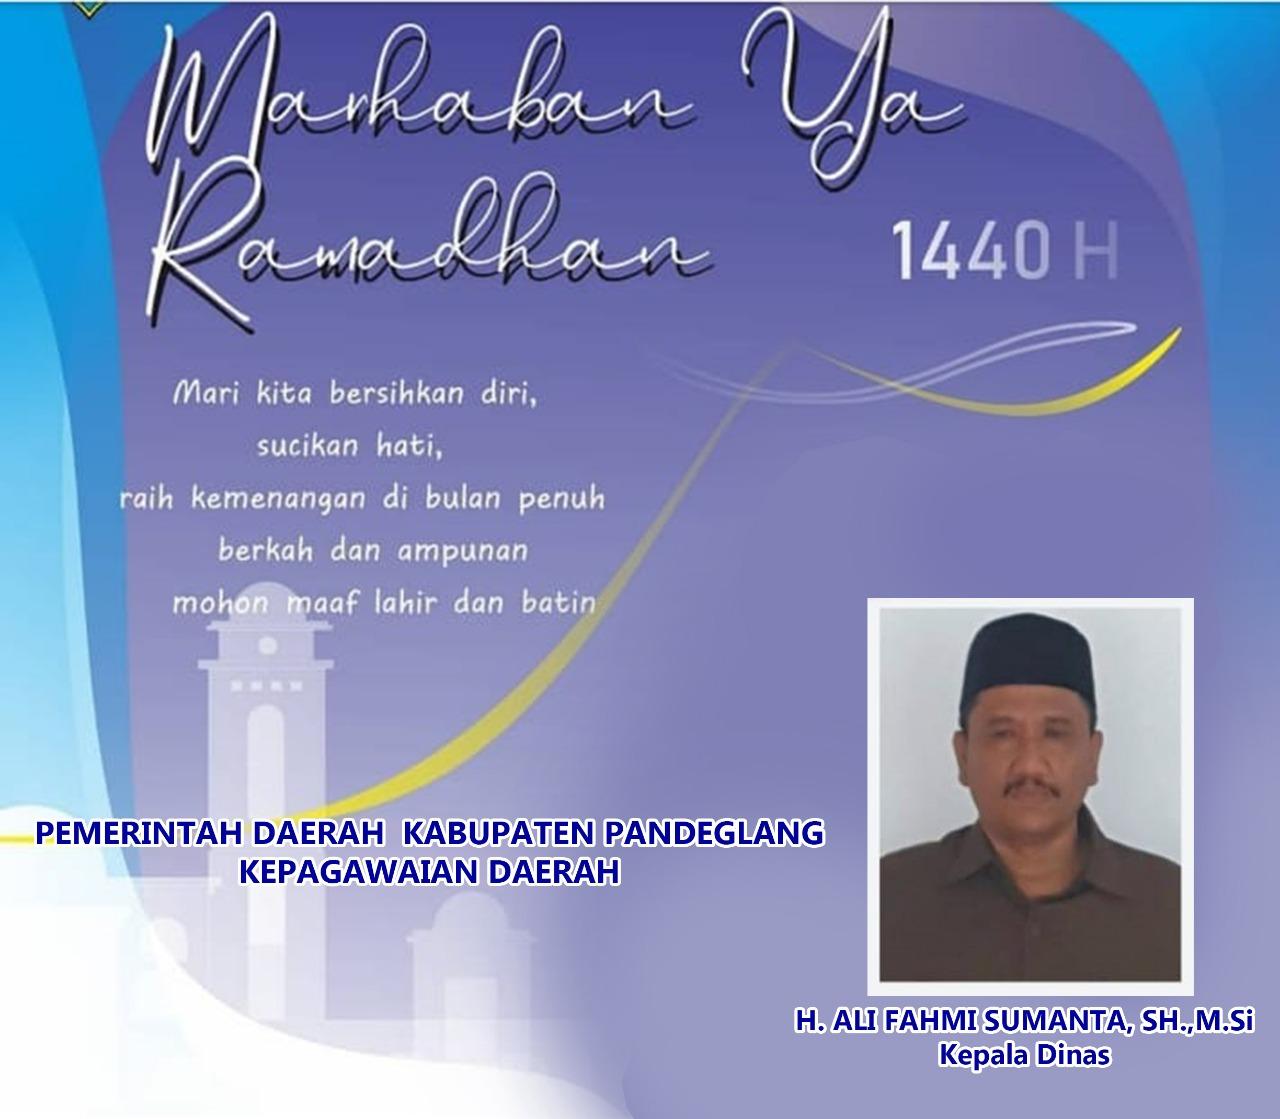 H.Ali Fahmi Sumanta,SH.M.Si